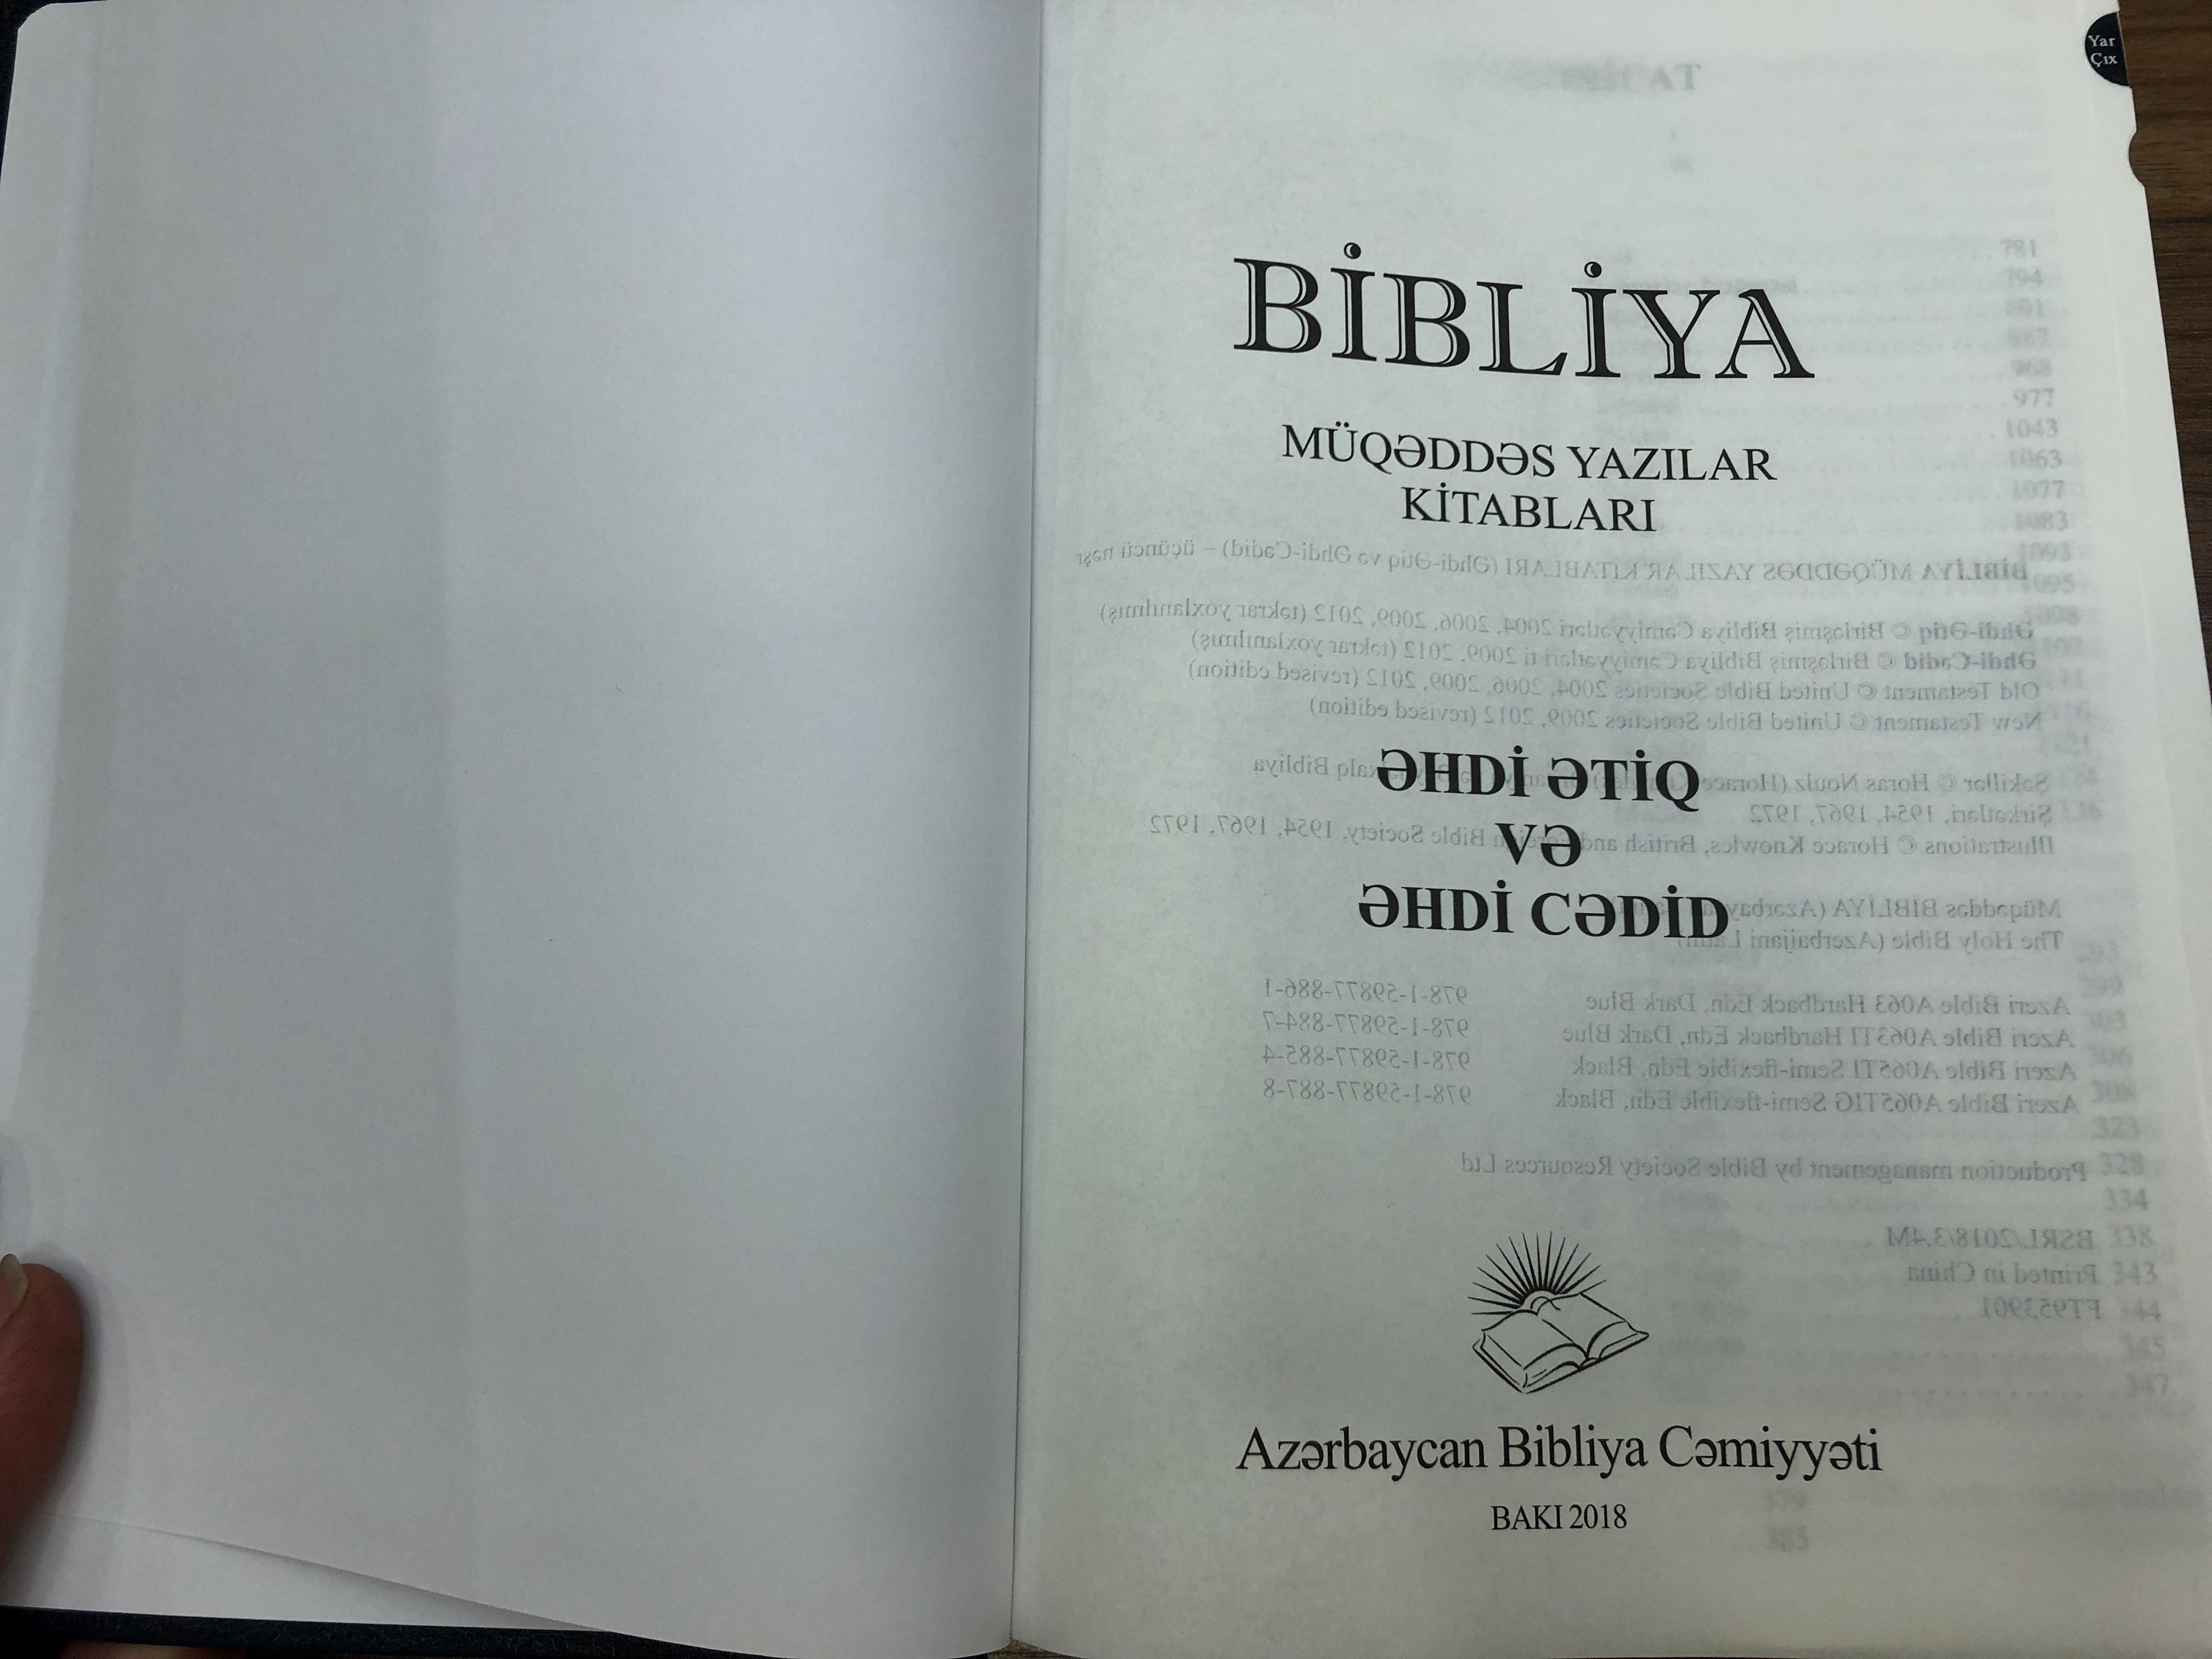 bibliya-azeri-language-with-thumb-index-and-color-maps-text-azerbaijani-latin-a063ti-4-.jpg